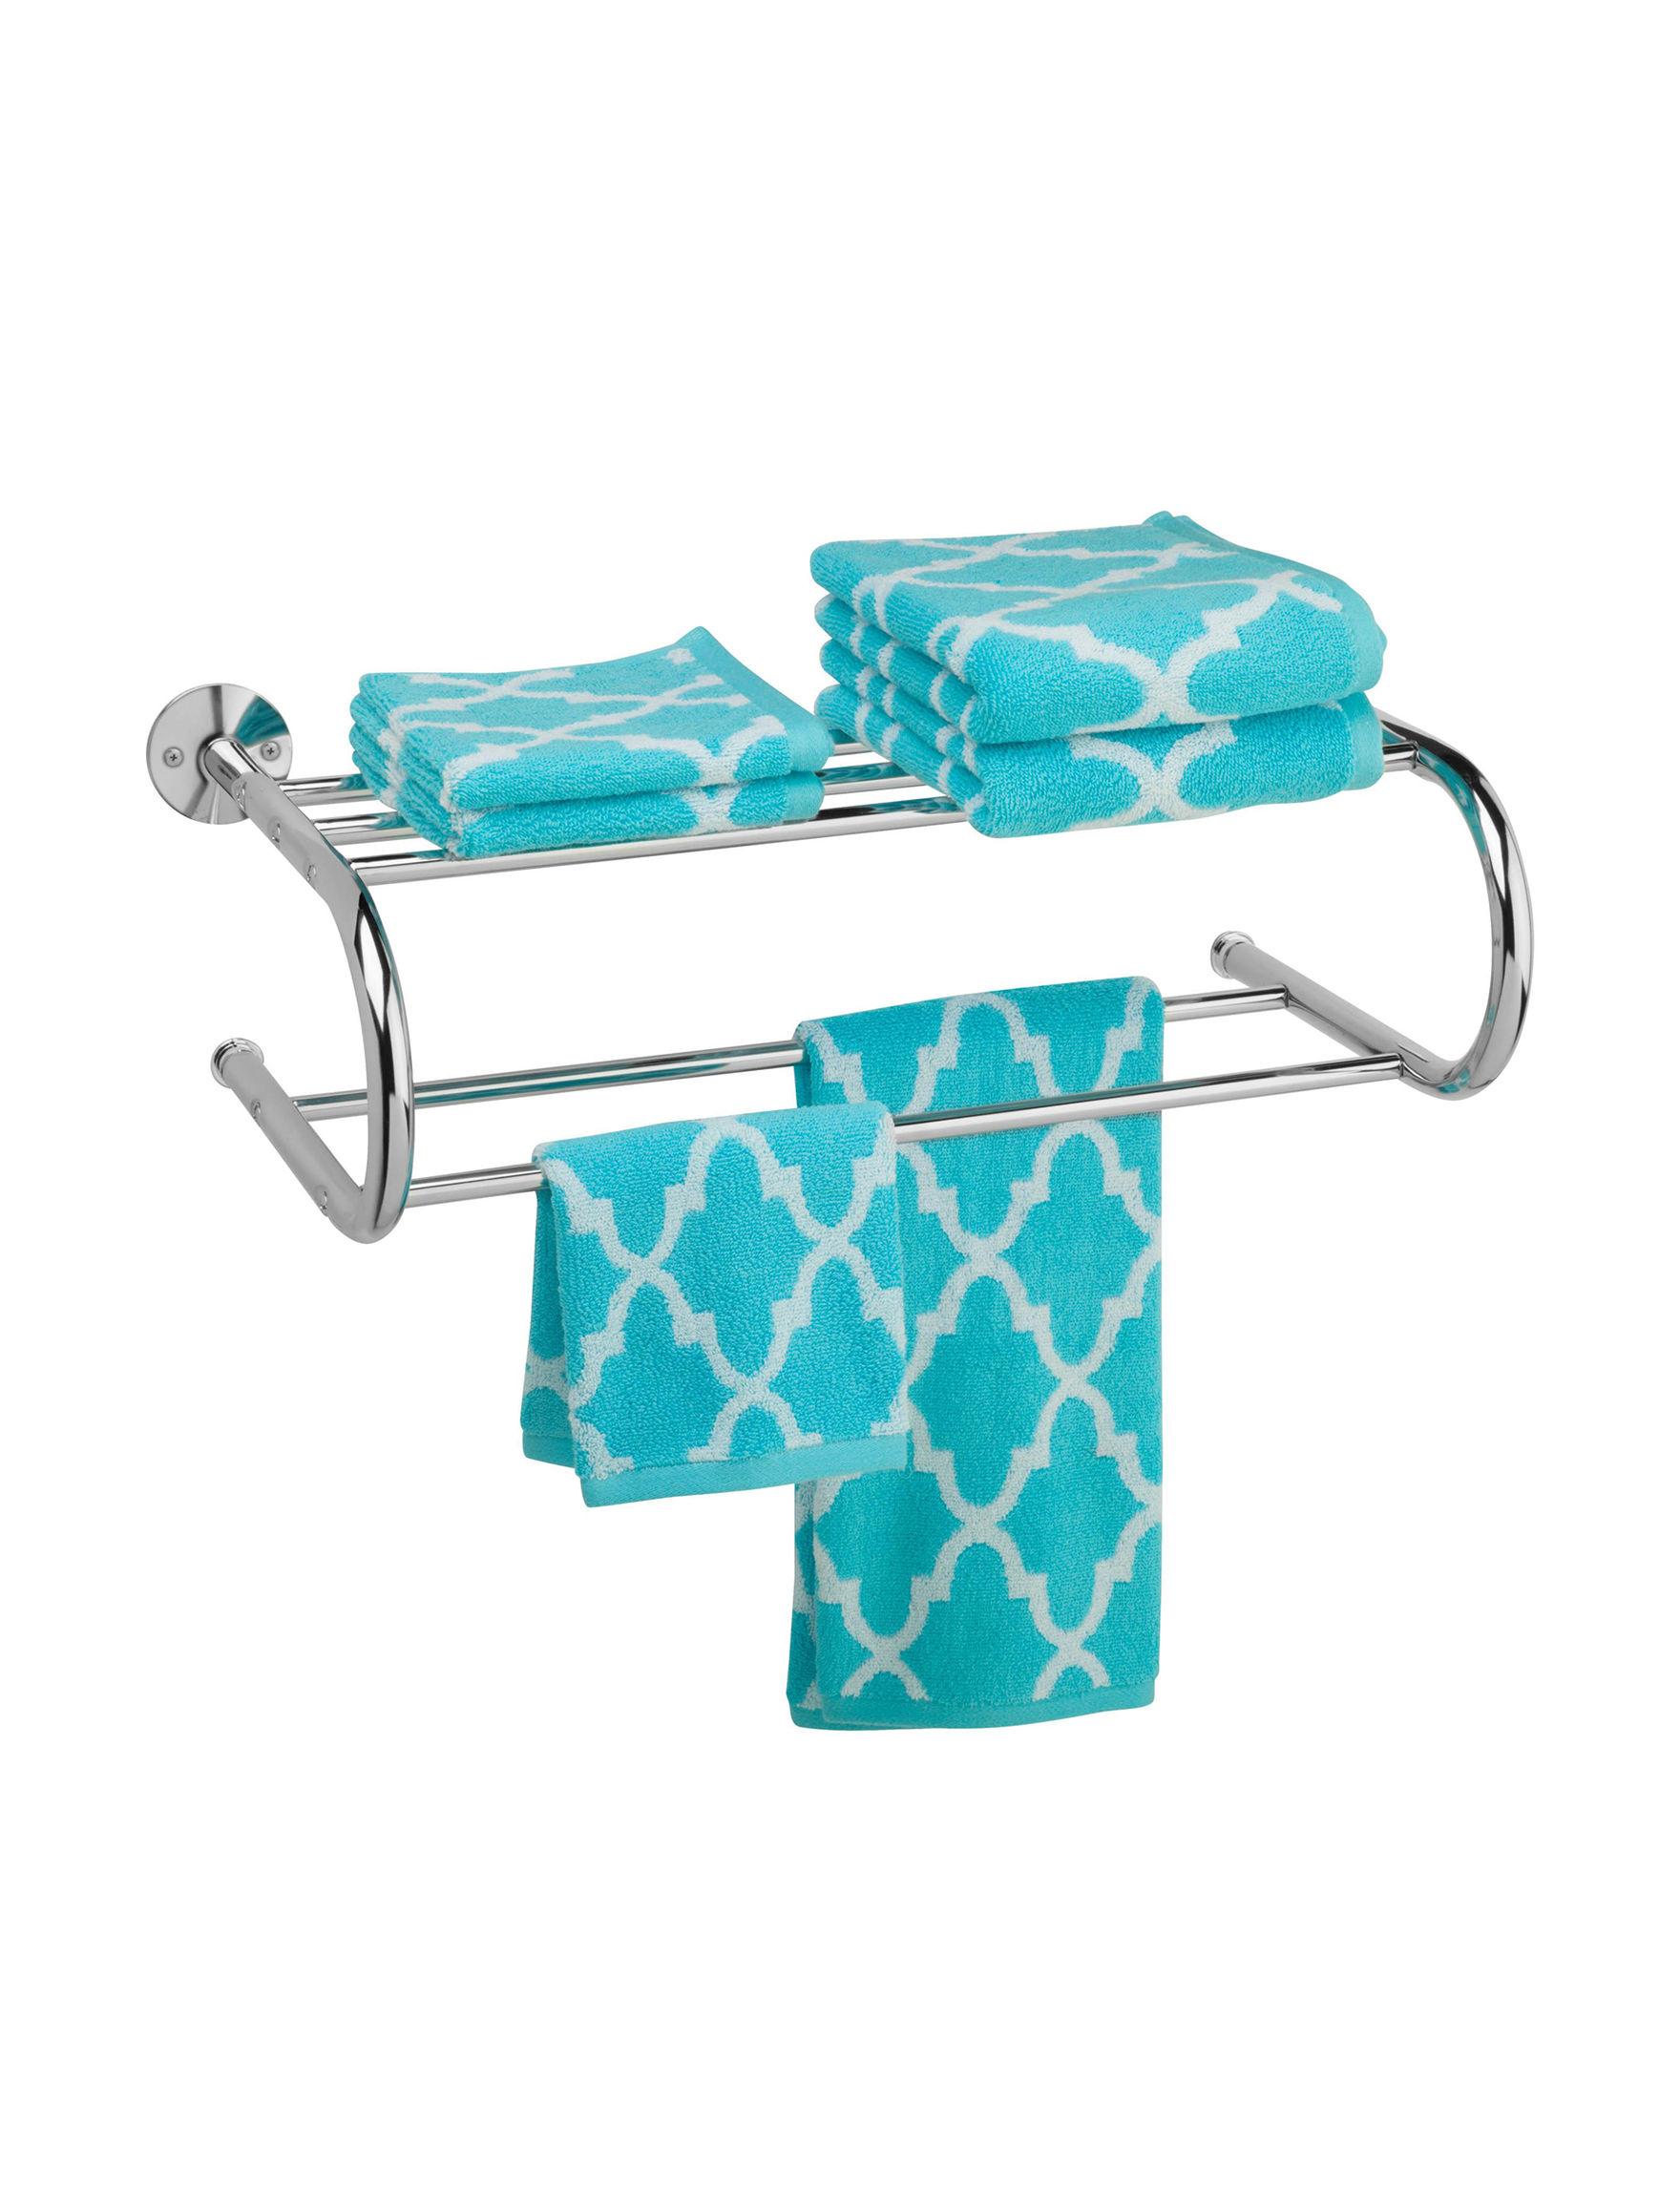 Honey-Can-Do International Chrome Bath Accessories